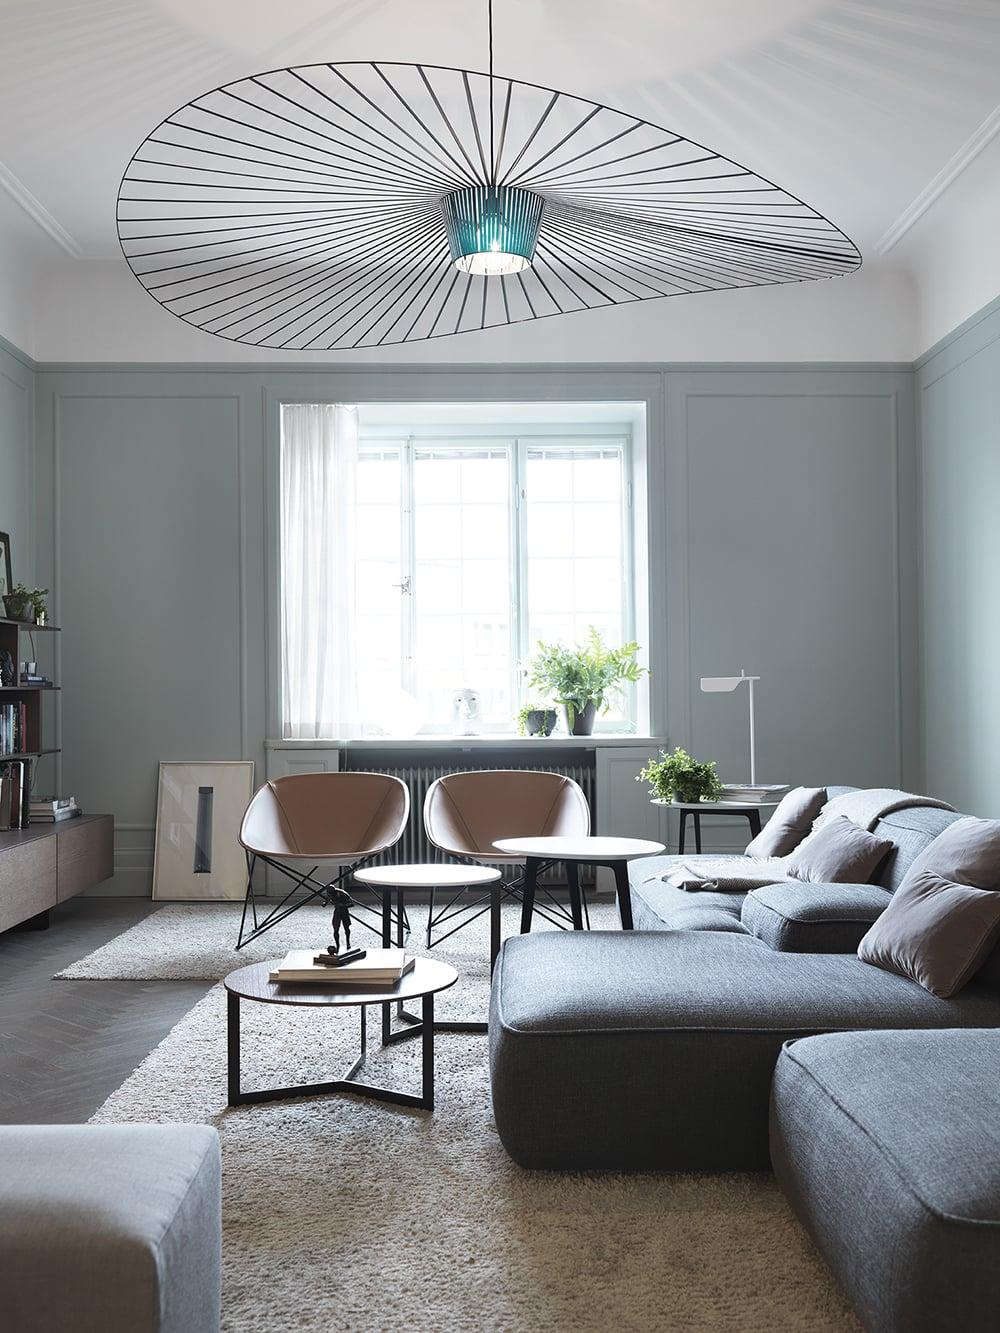 Home in greengrey  COCO LAPINE DESIGNCOCO LAPINE DESIGN